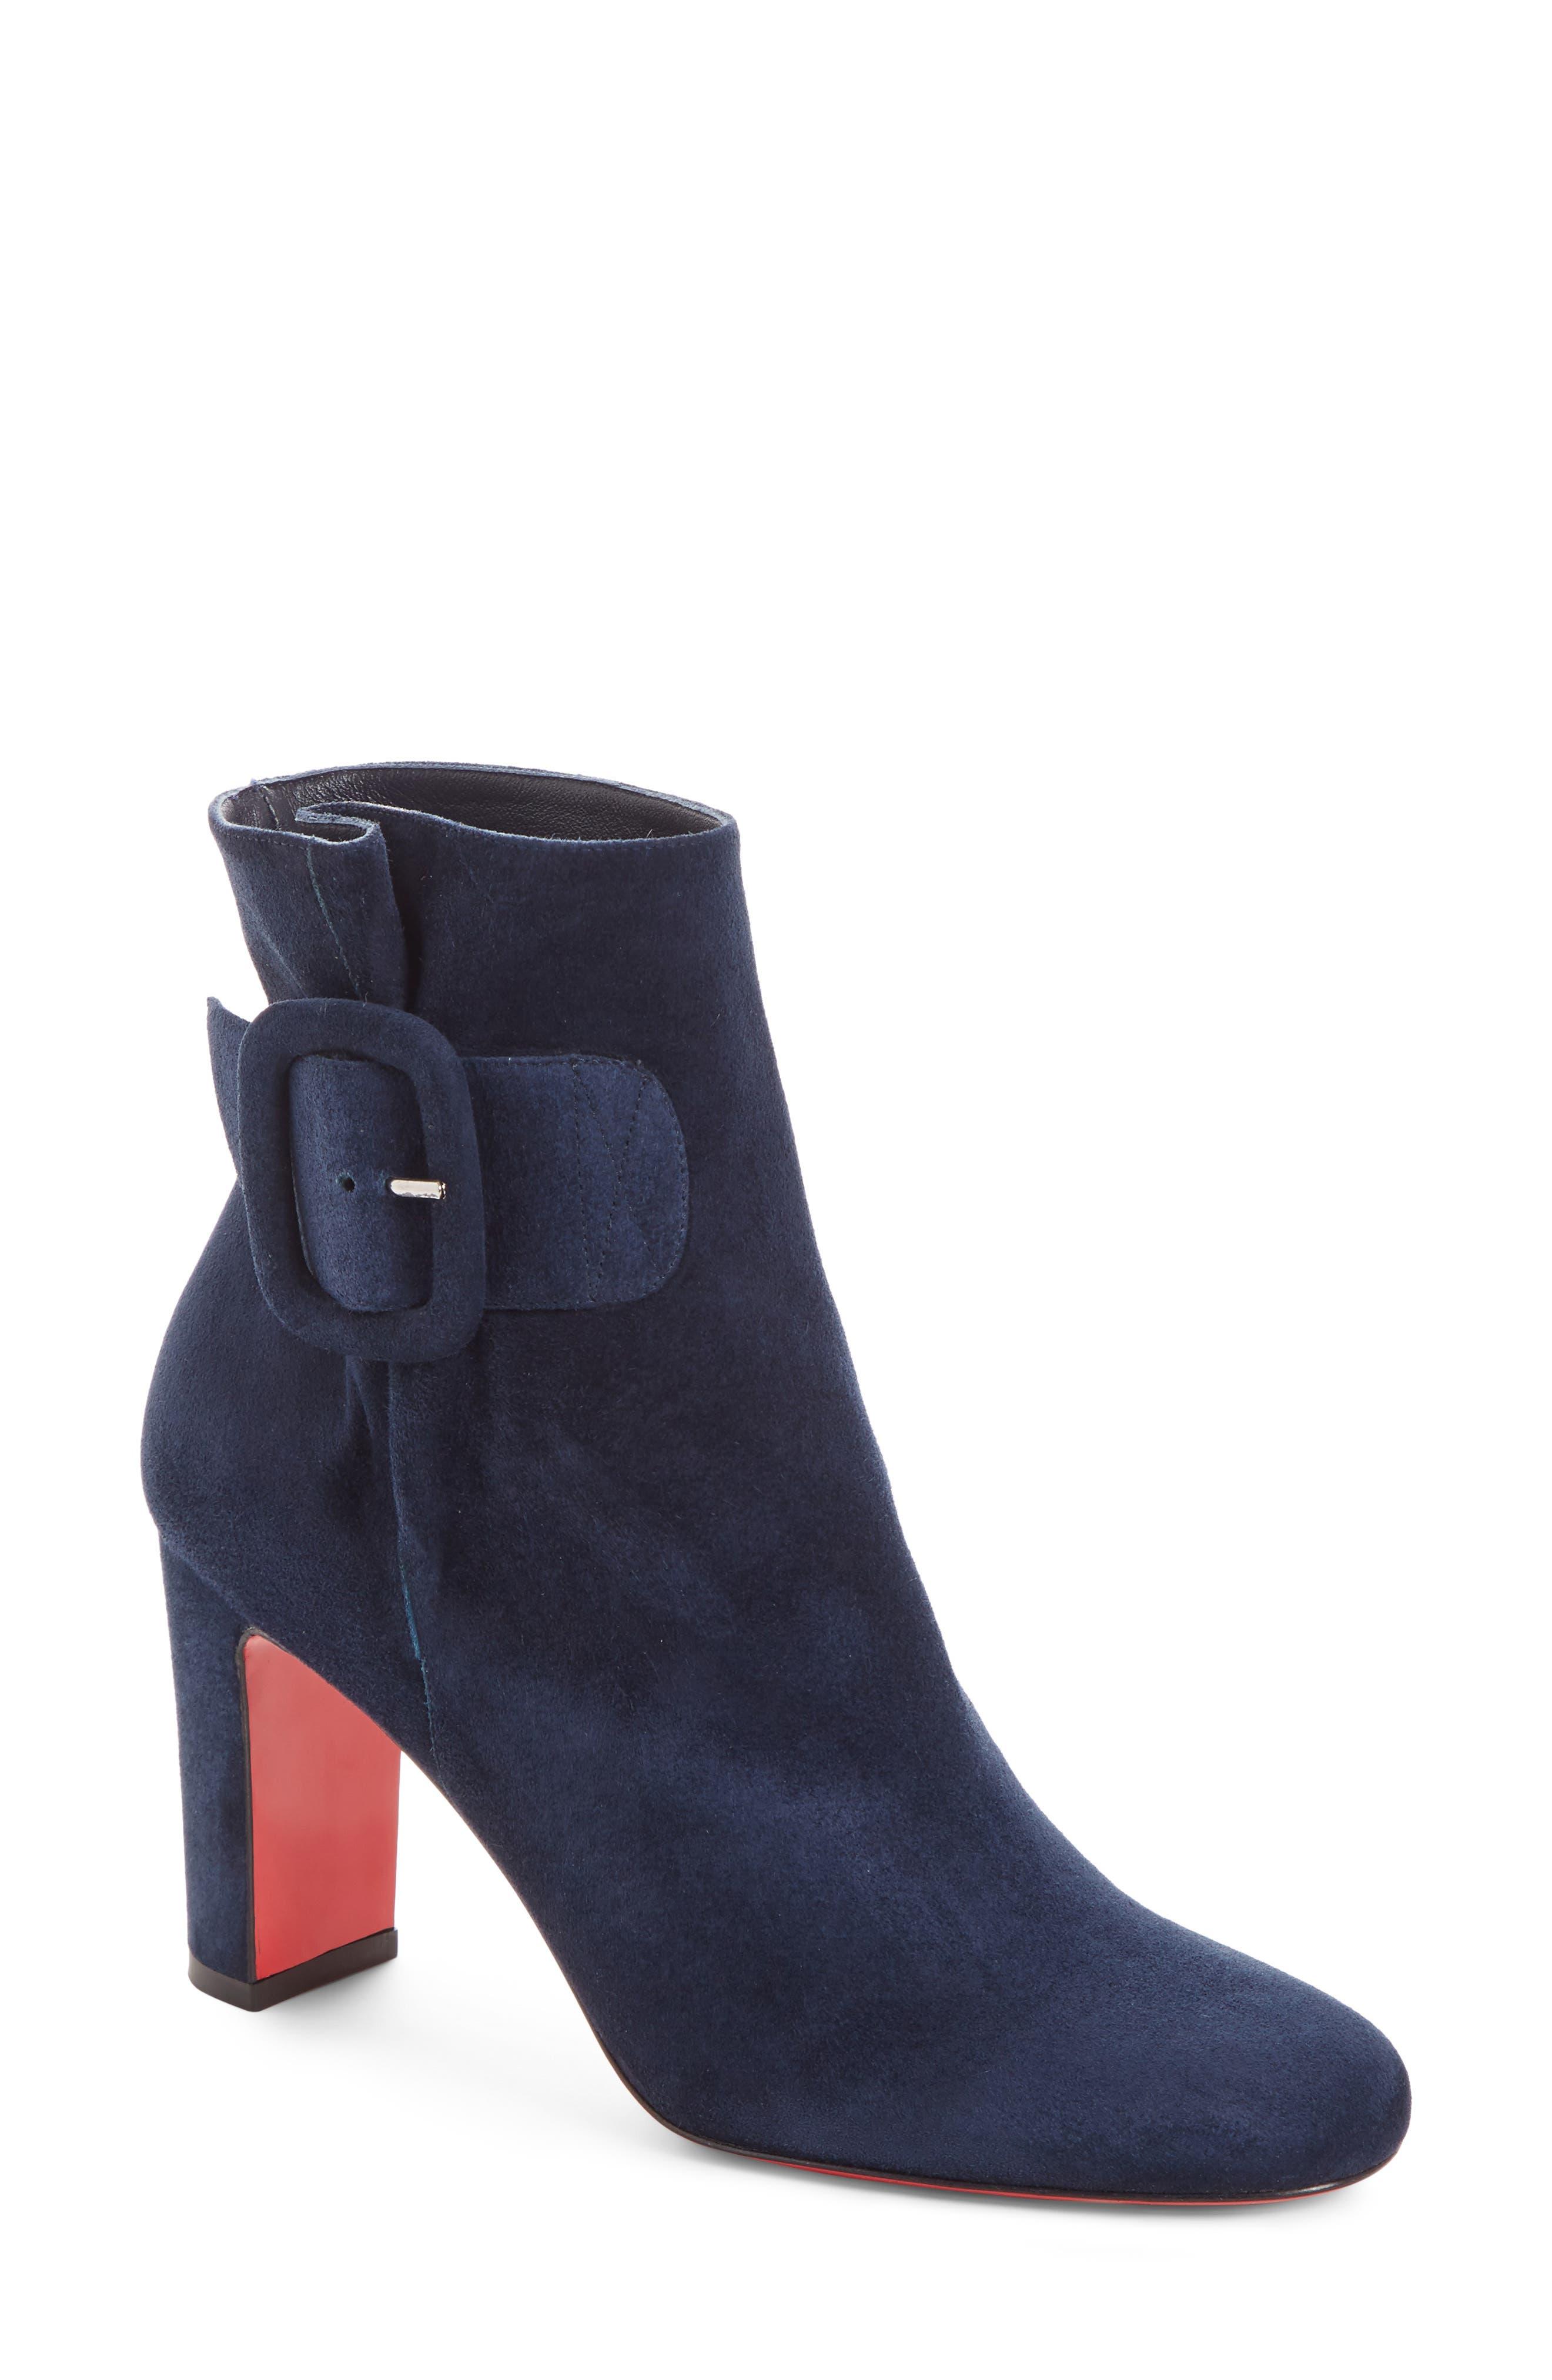 3111f03fc5a5 Christian Louboutin Women s Booties Shoes